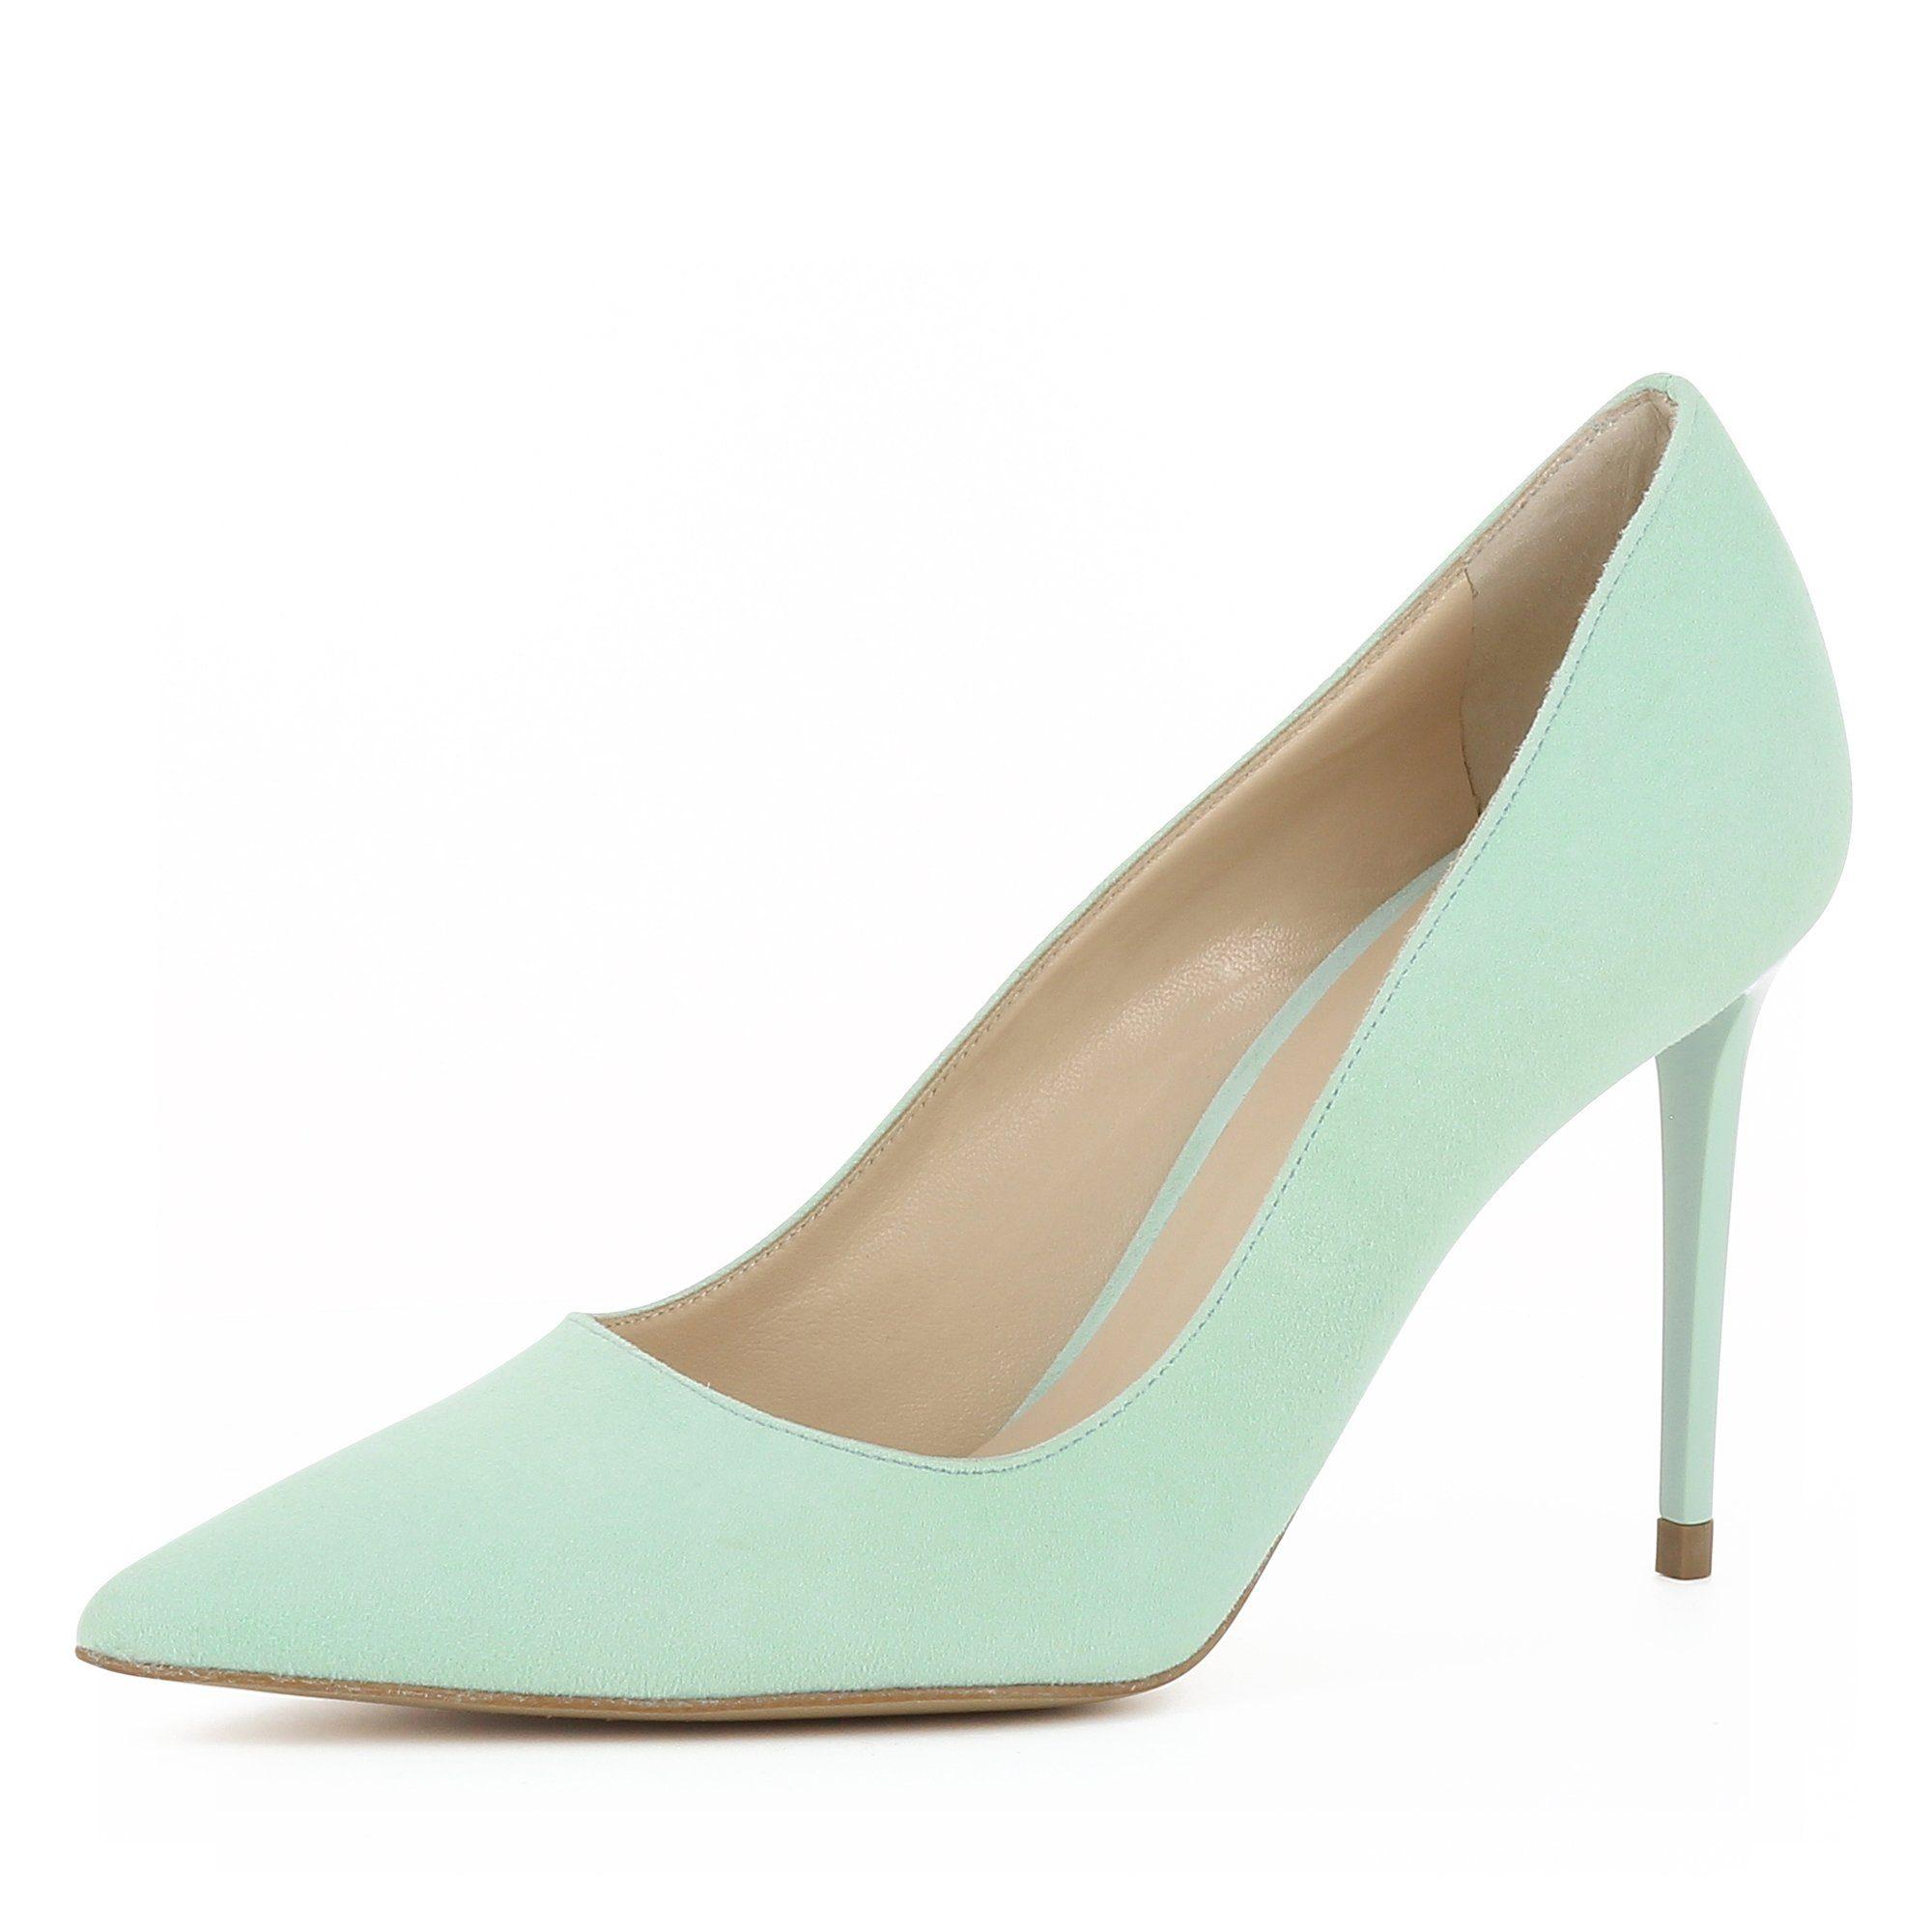 Evita NATALIA Pumps online kaufen  mint